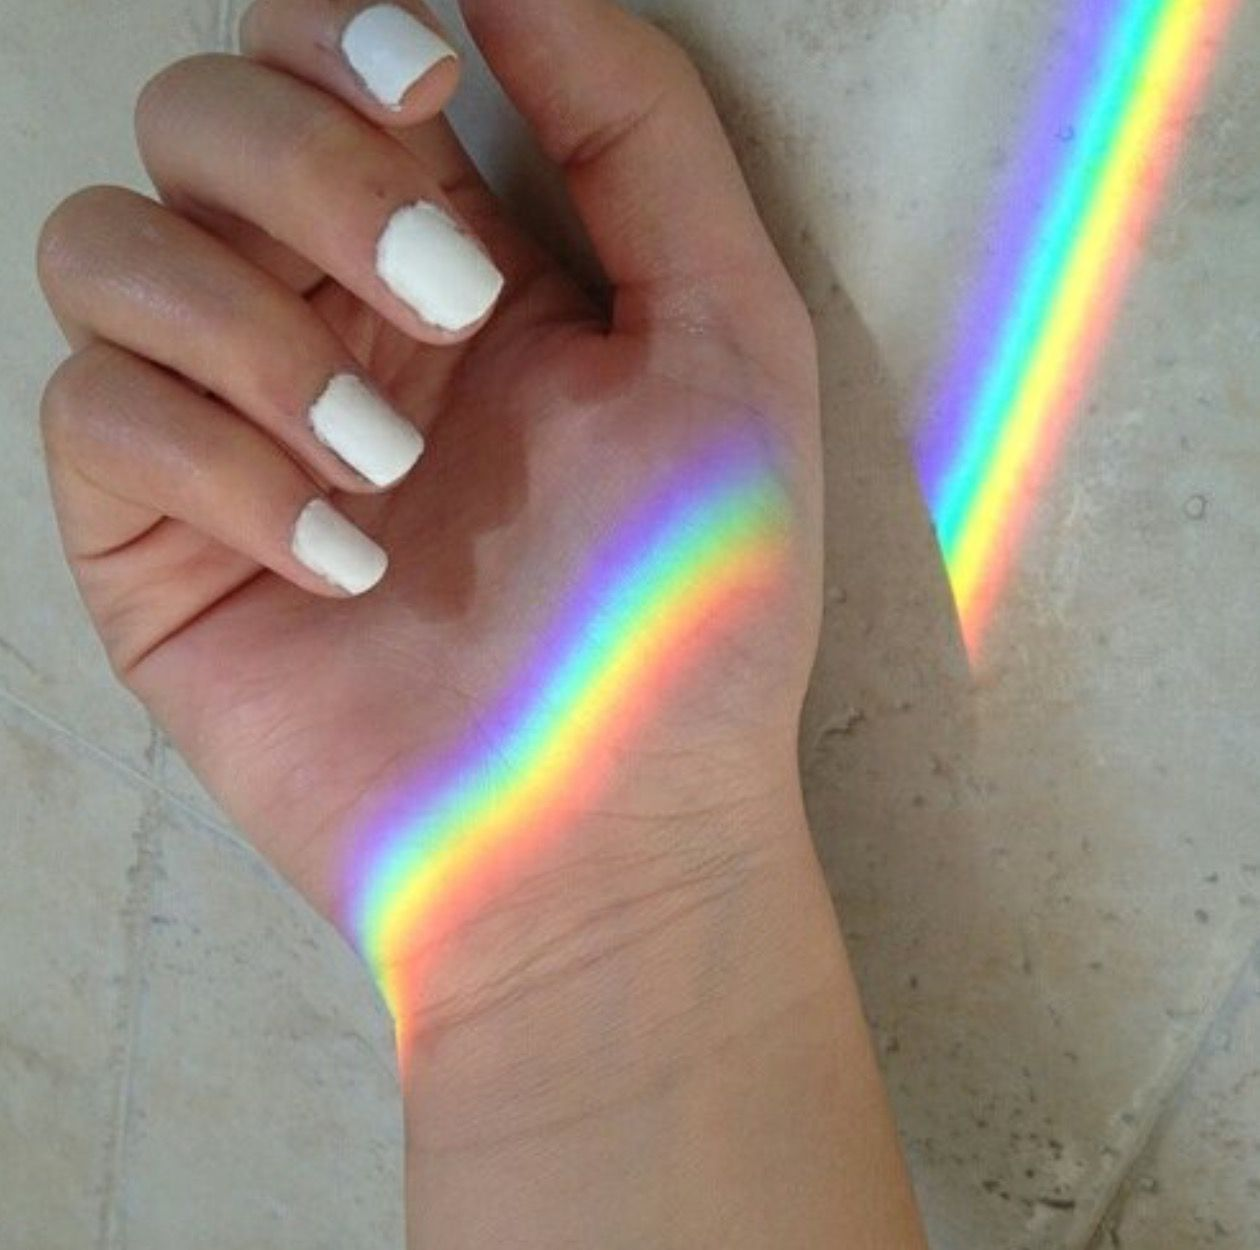 Please abduct me  #mondayblues #IslandUniverse #sisterjane | Rainbow aesthetic